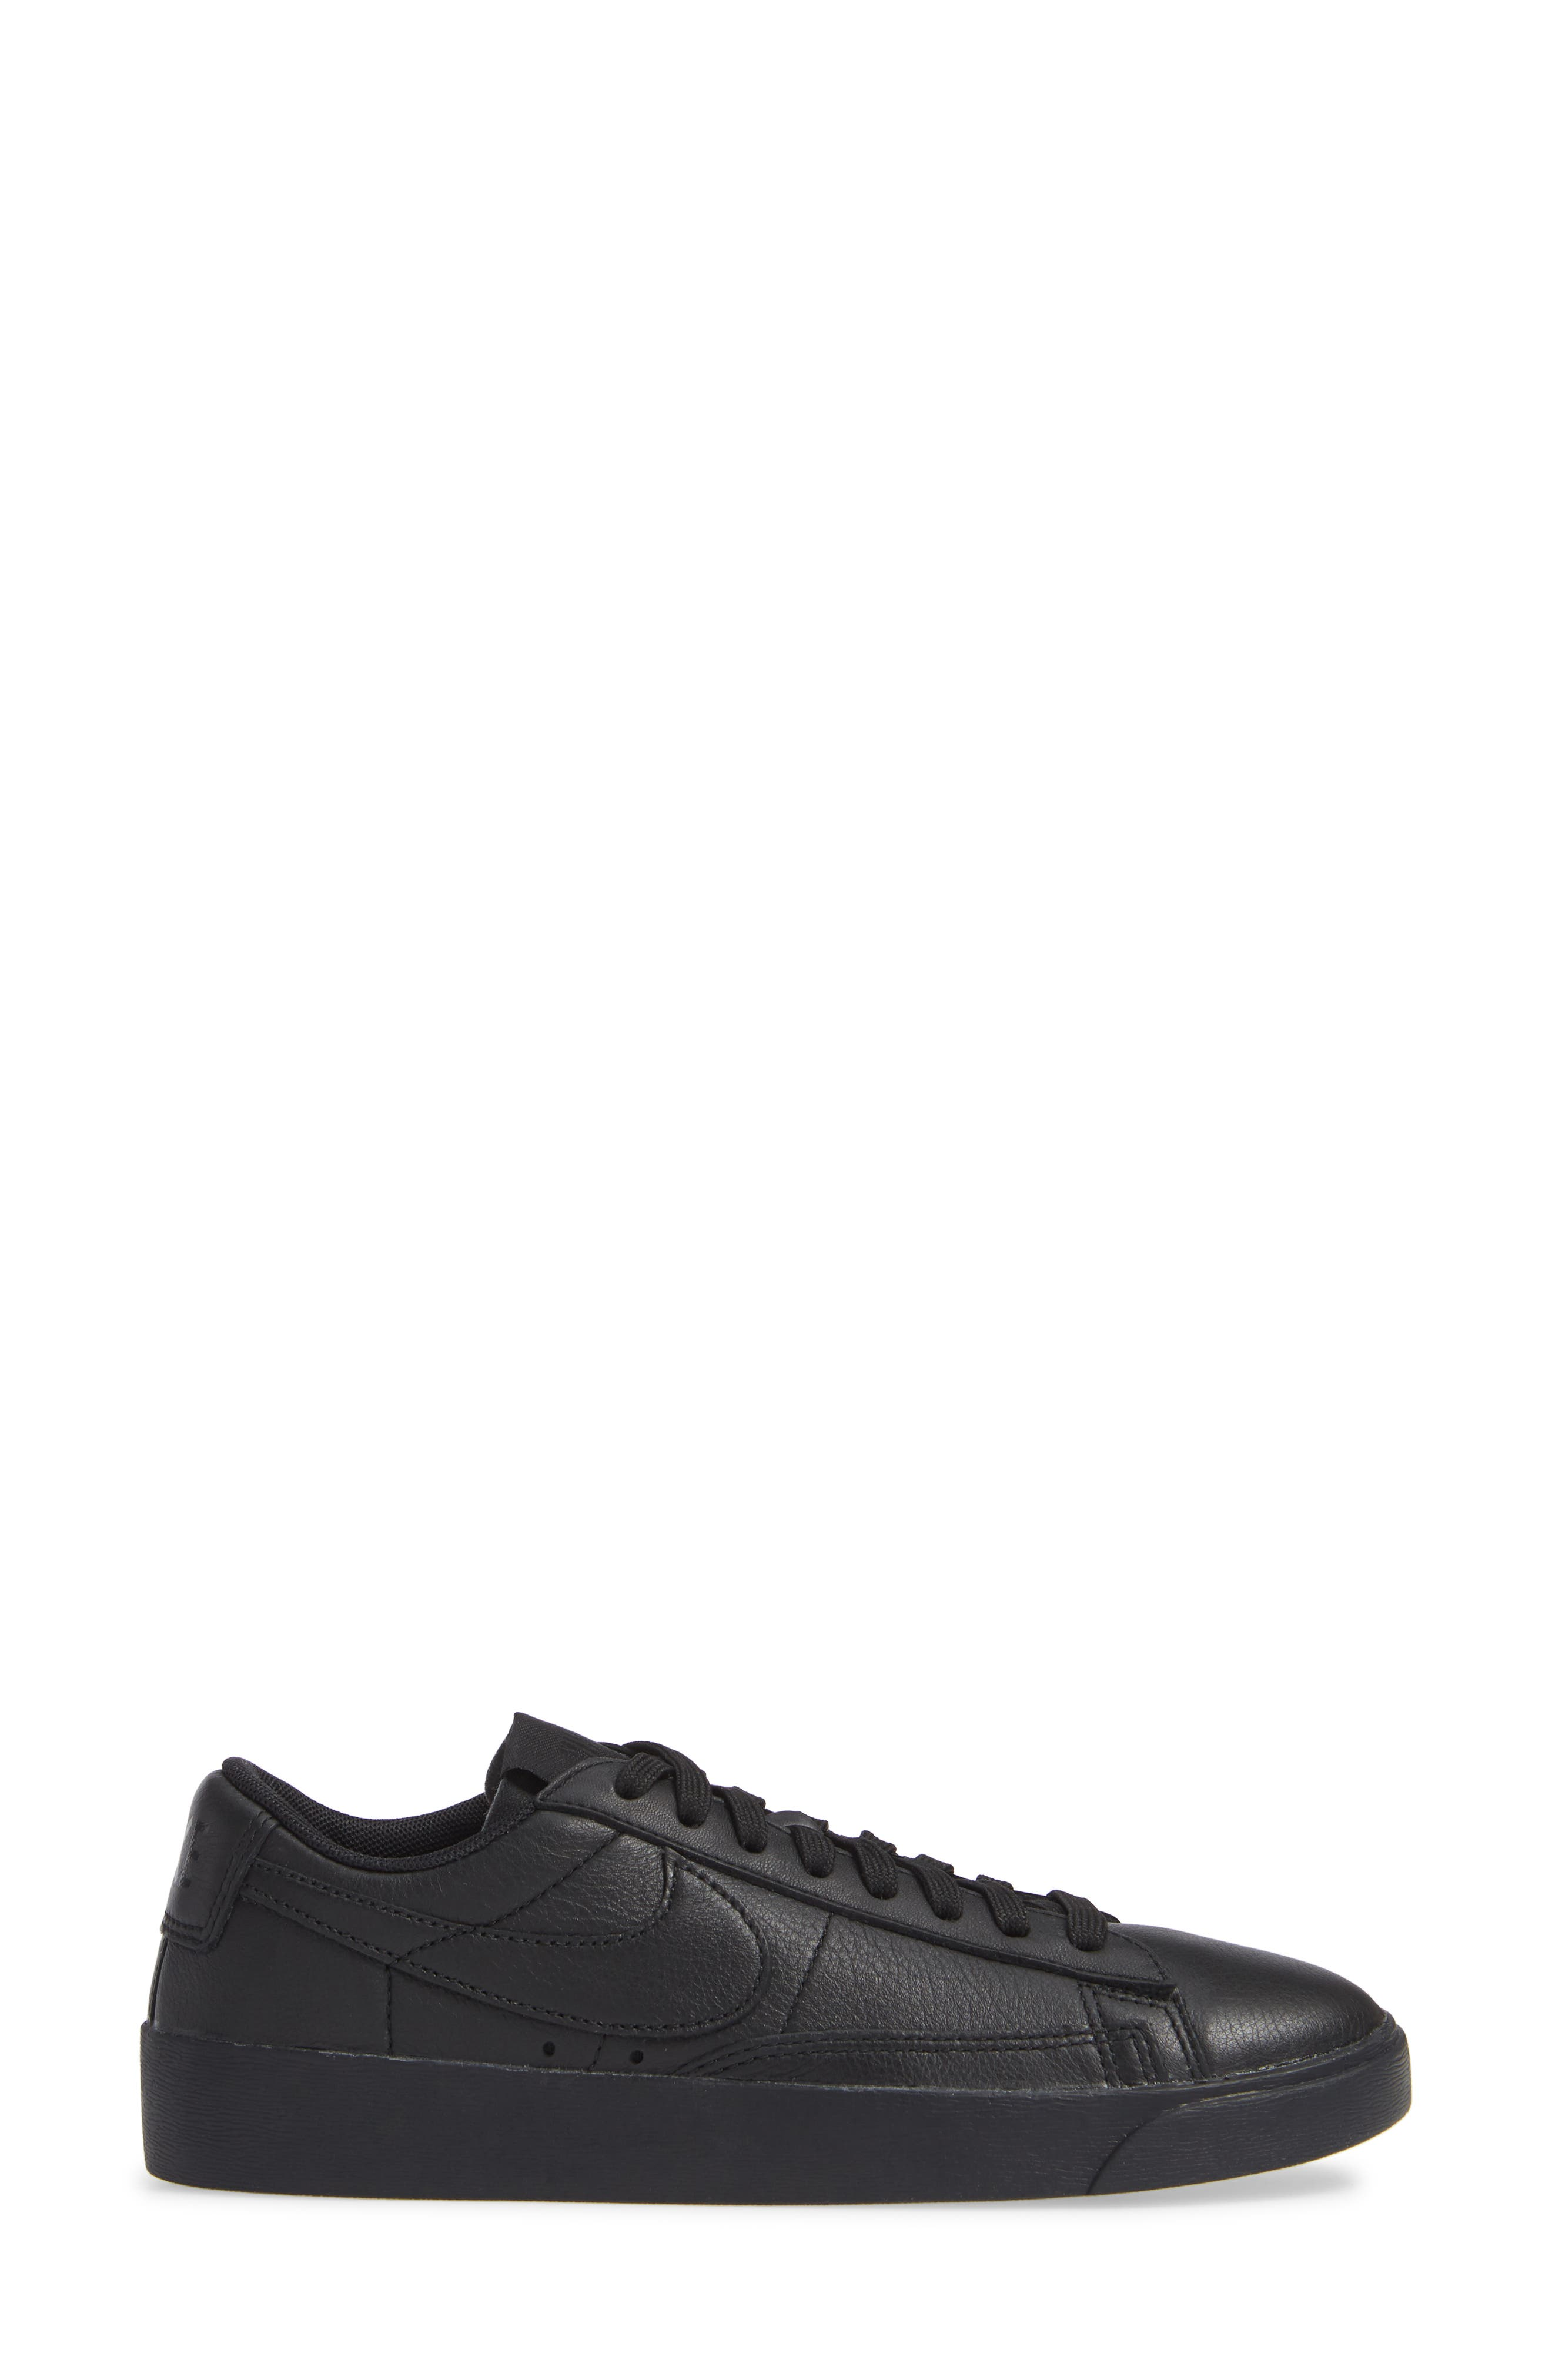 Blazer Low SE Sneaker,                             Alternate thumbnail 3, color,                             BLACK/ BLACK-BLACK